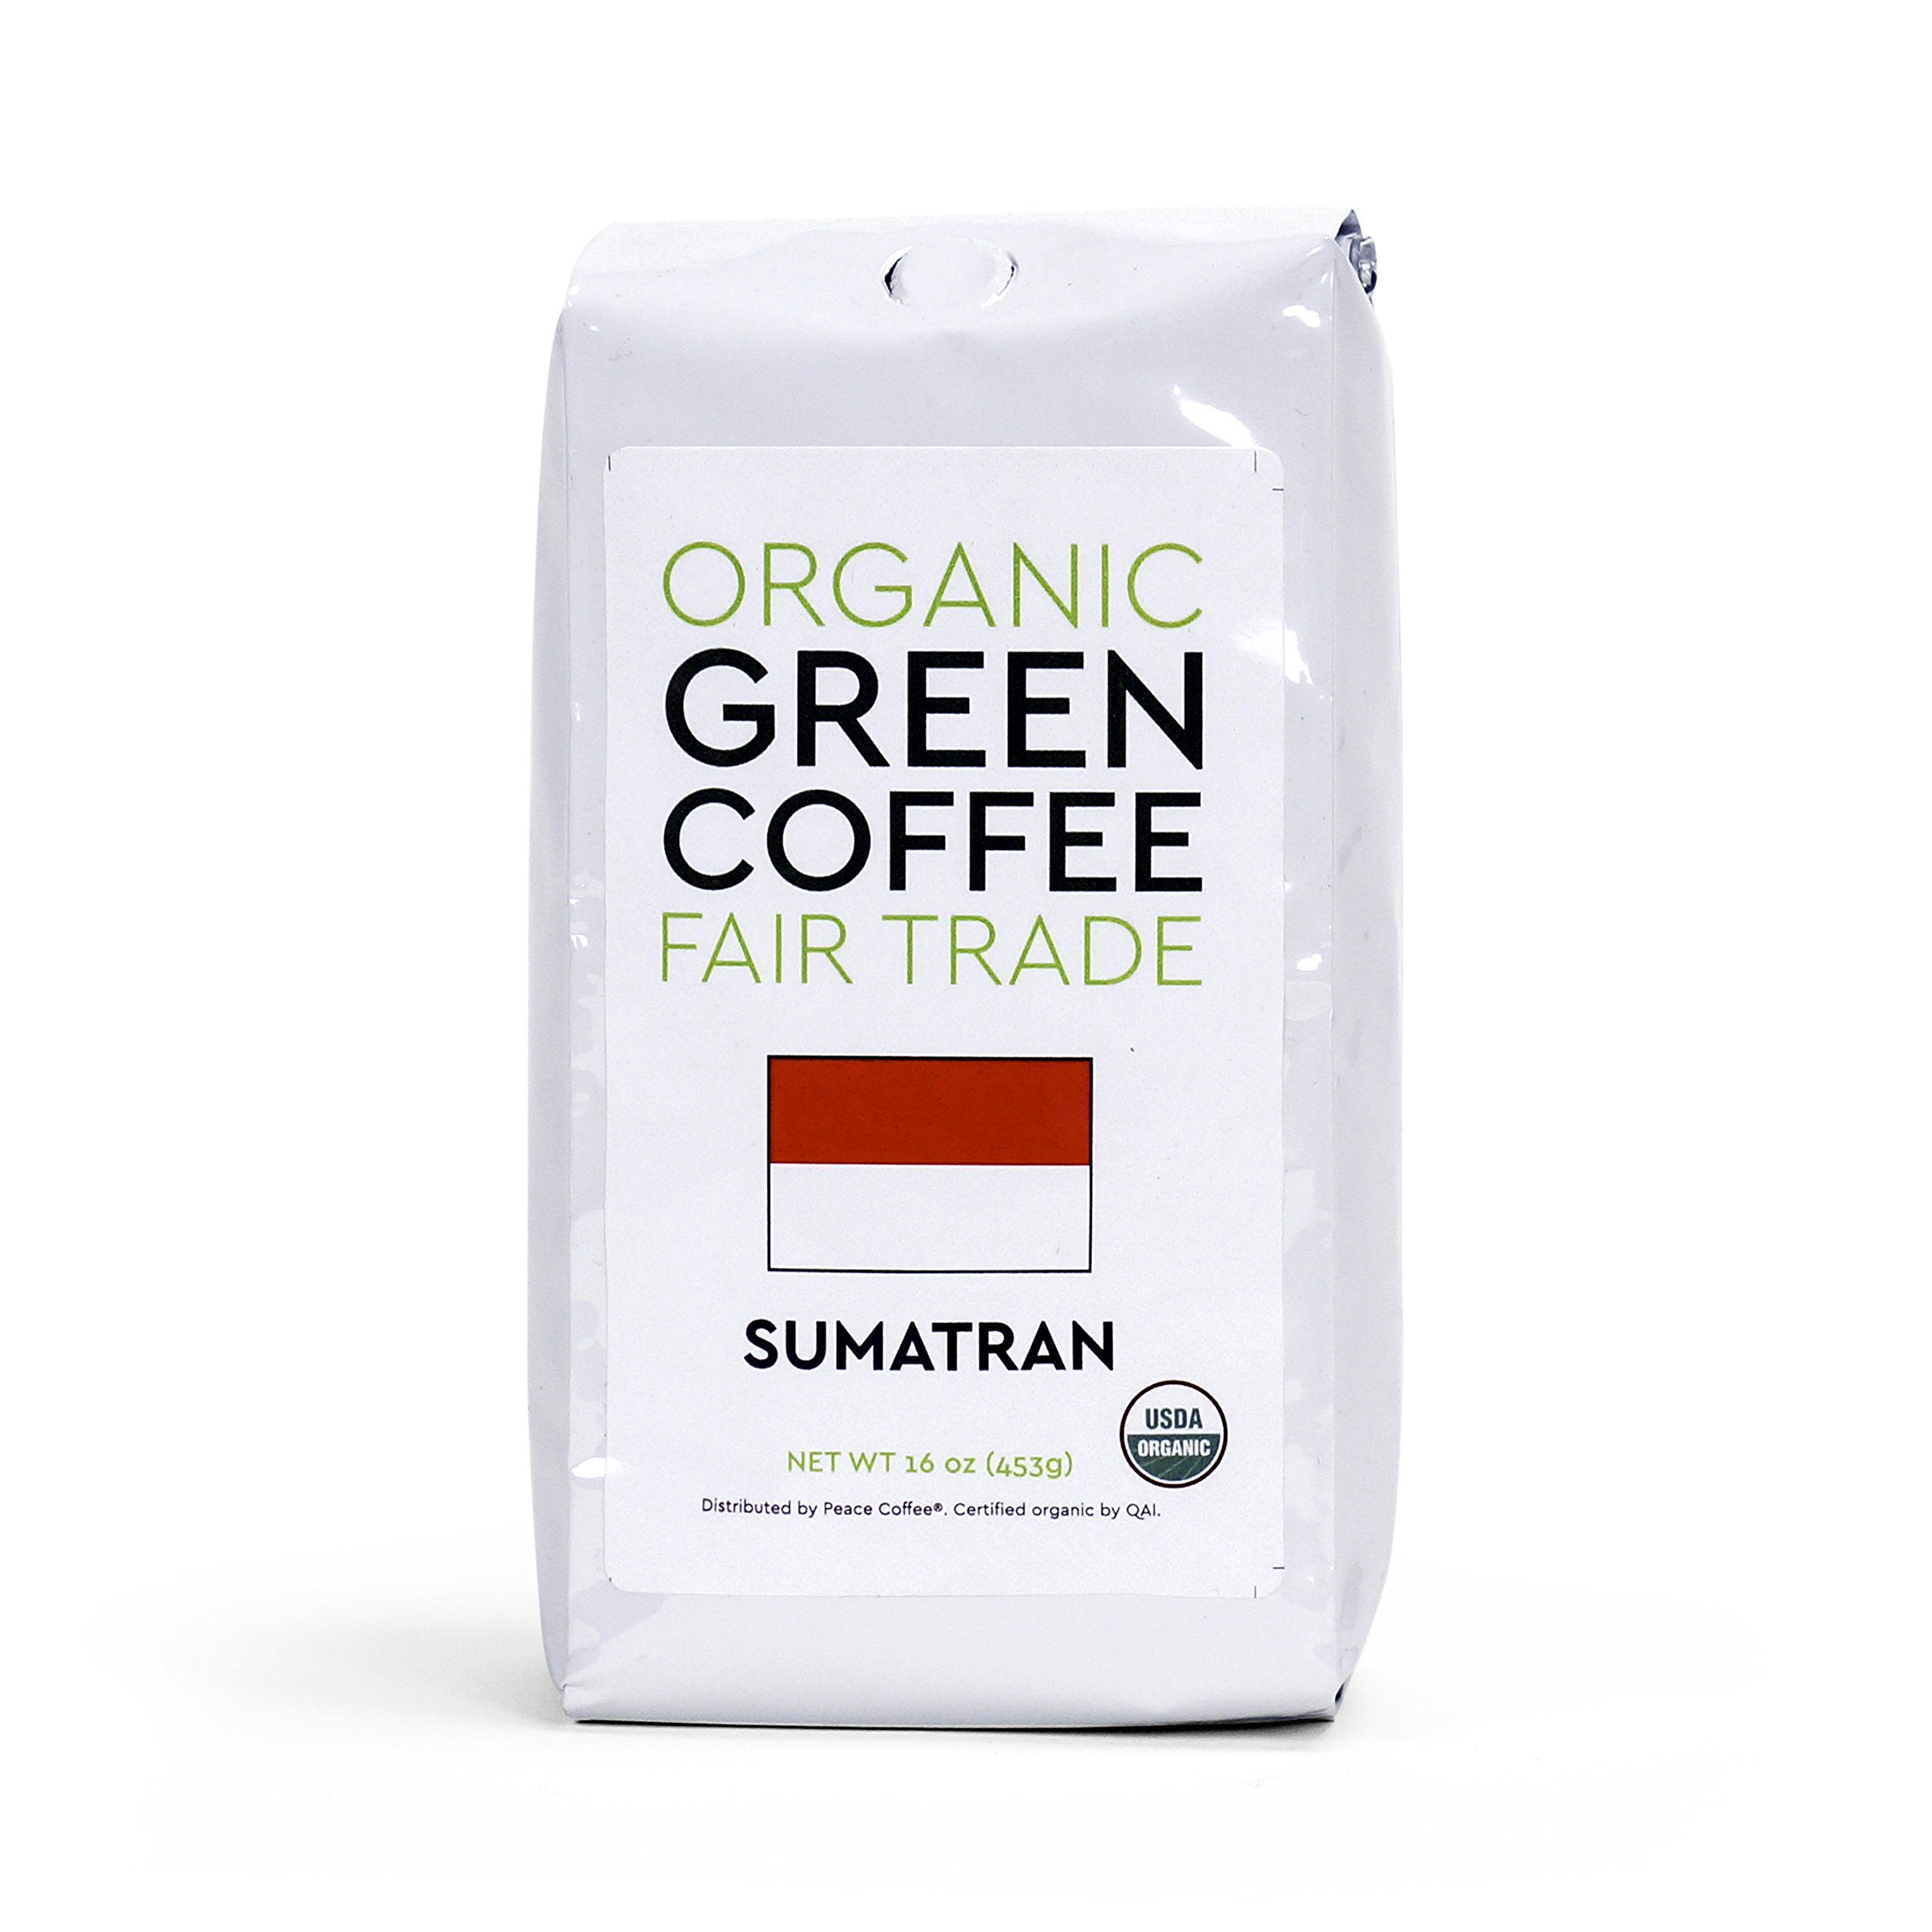 Peace Coffee Fair Trade Certified Organic Green Unroasted Coffee Beans (Sumatra Gayo Mountain Fair Trade Organic)